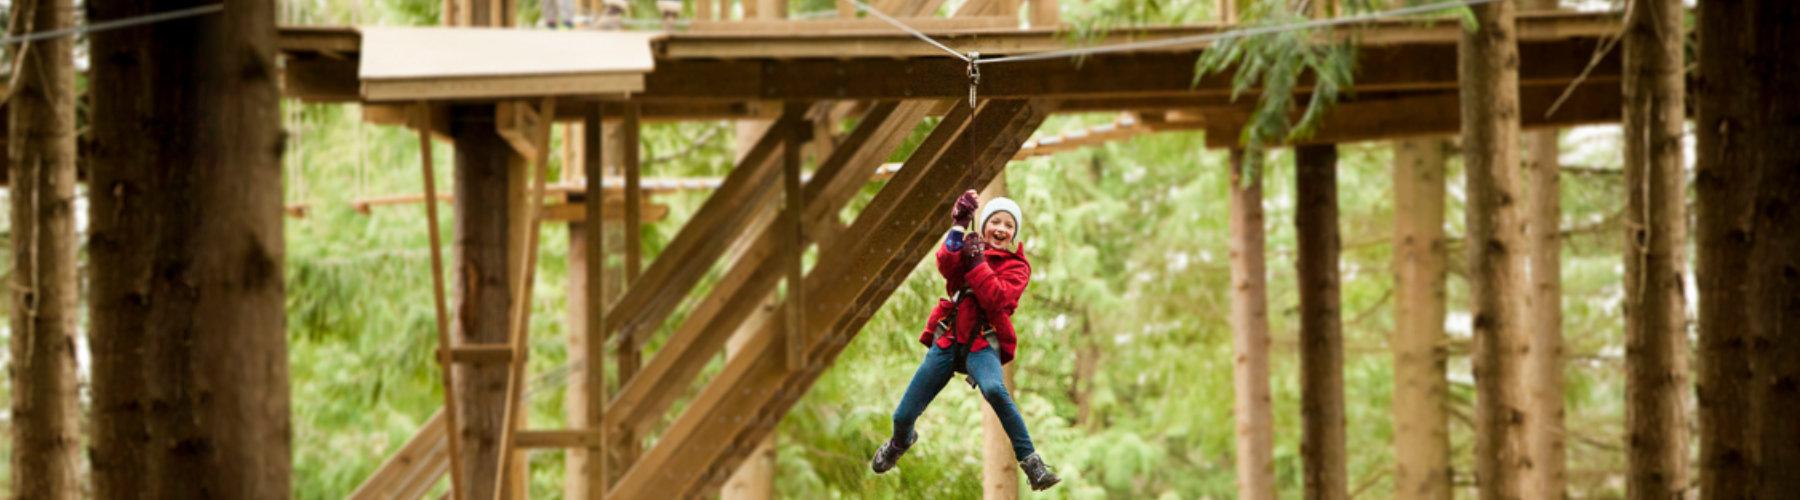 Go Ape - Adventures in Wye Valley